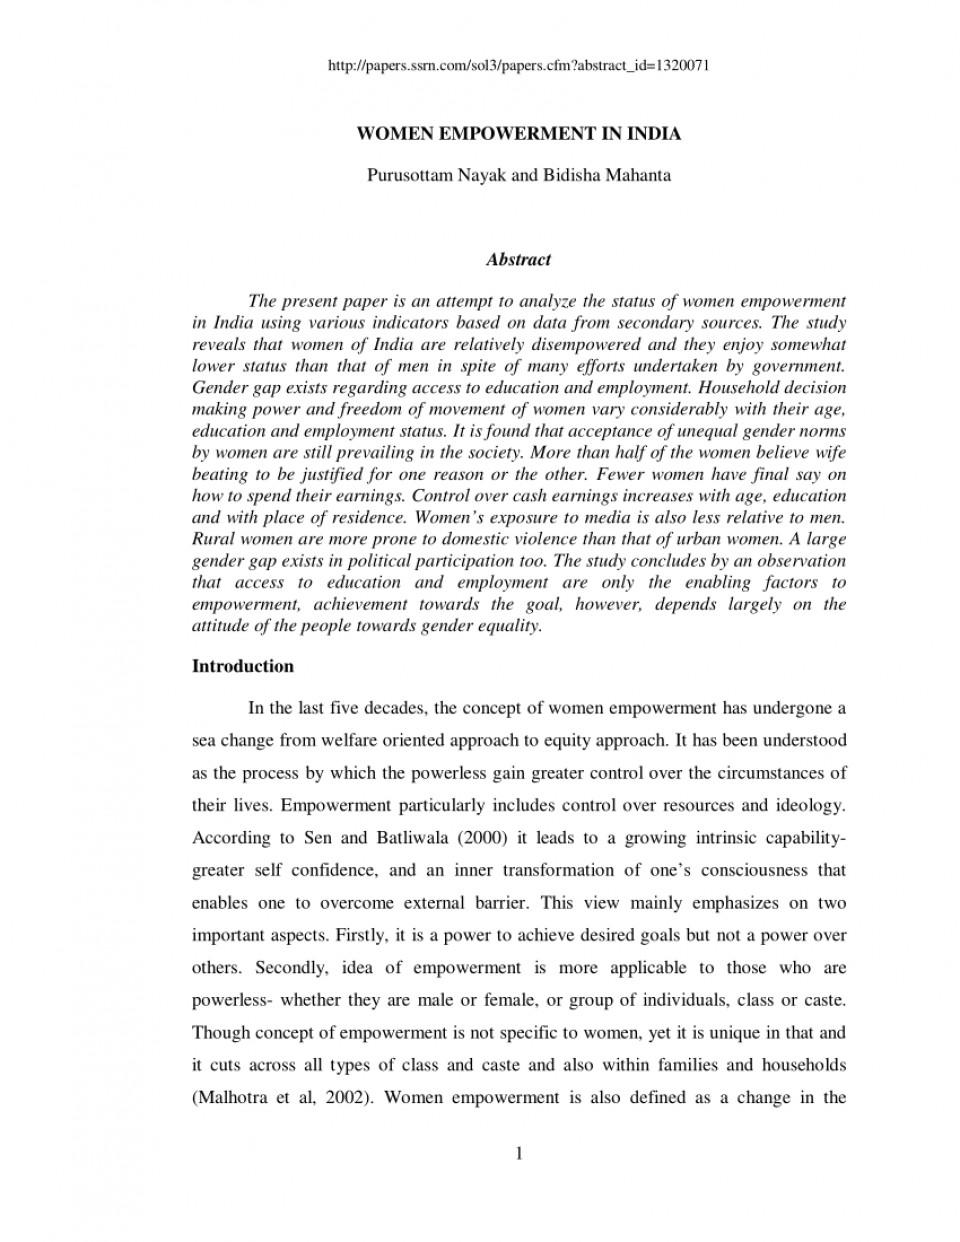 Gender Equality & Women Empowerment Essay